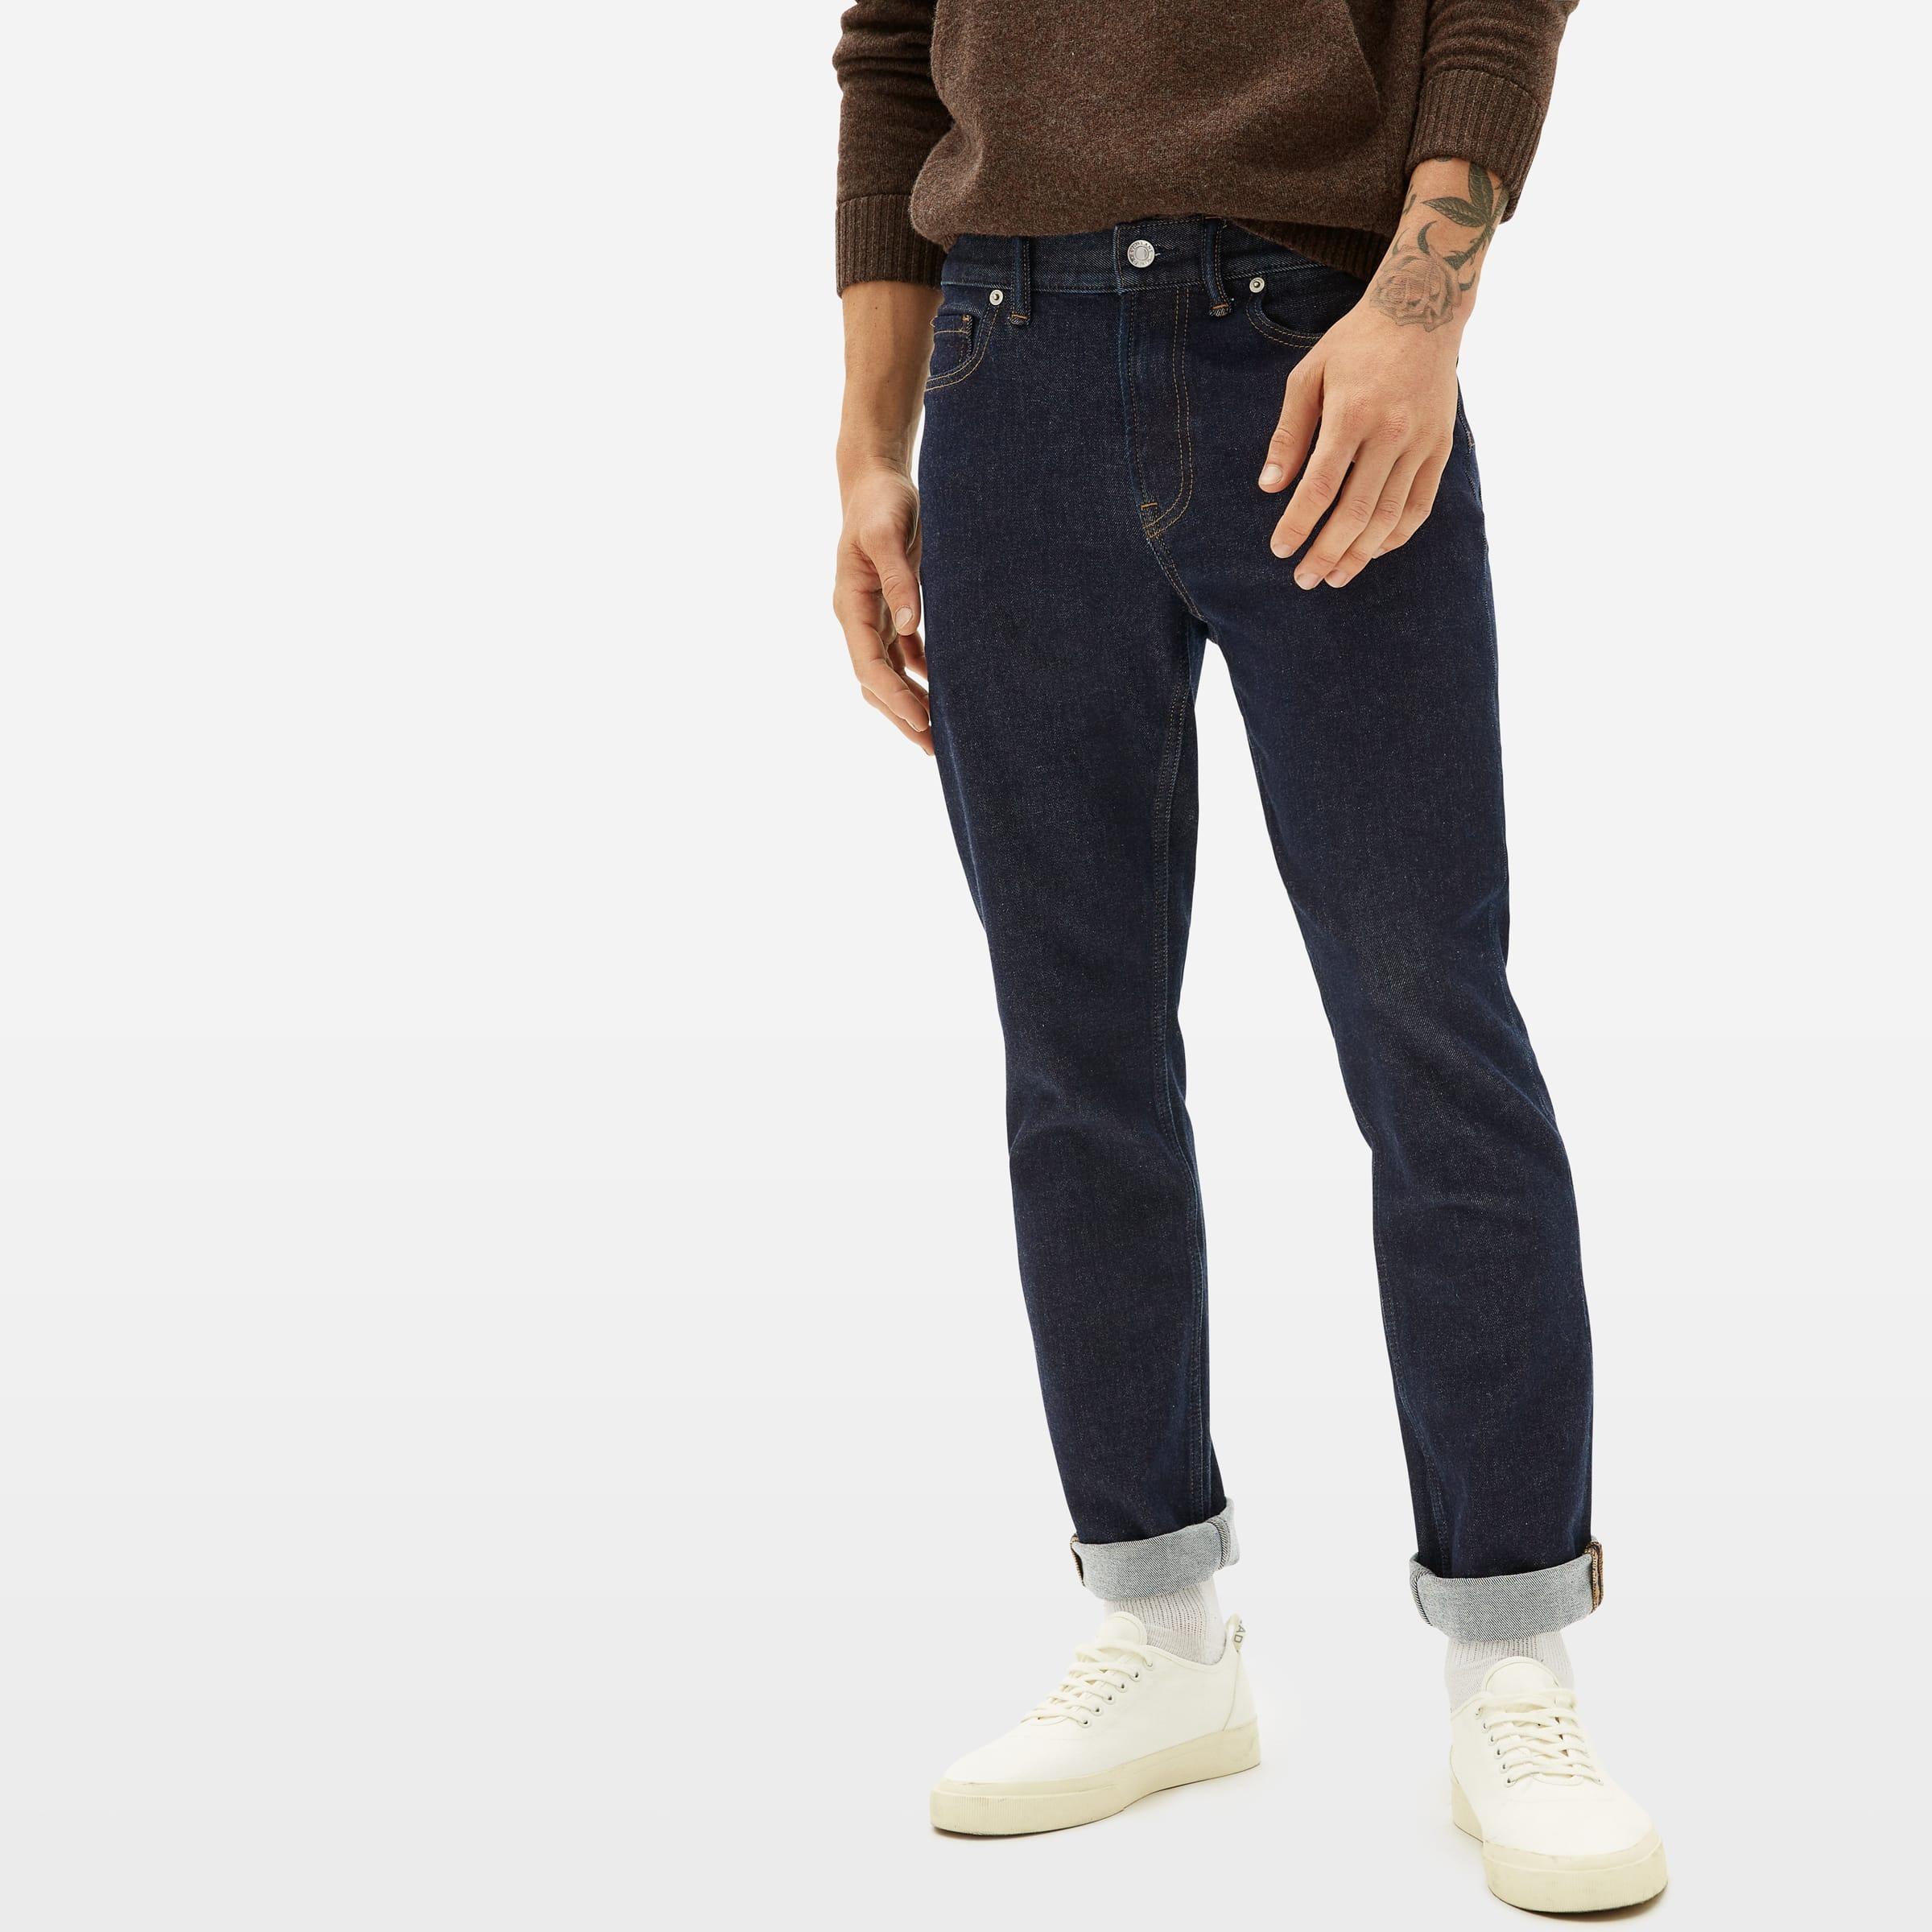 Everlane Slim 4-Way Stretch Organic Jeans